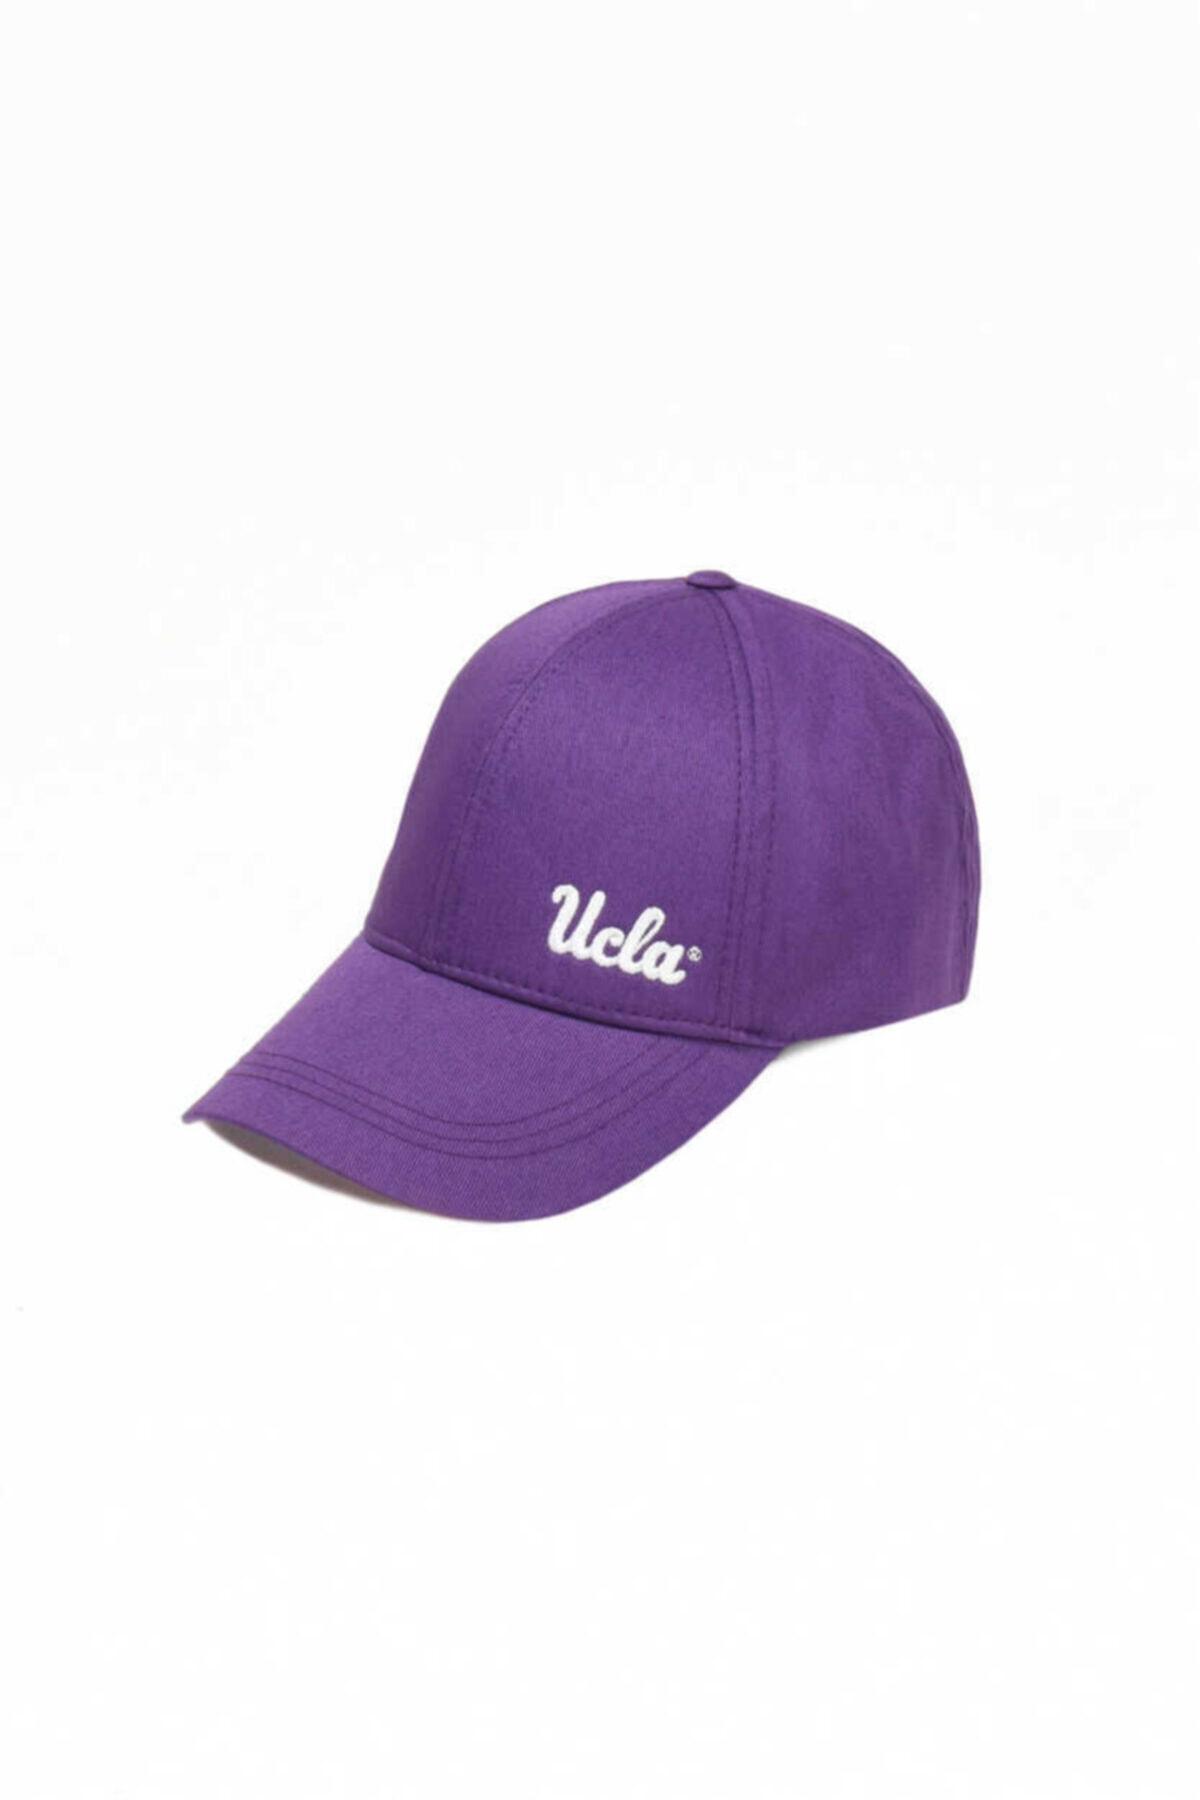 Jenner Mor Baseball Cap Nakışlı Şapka